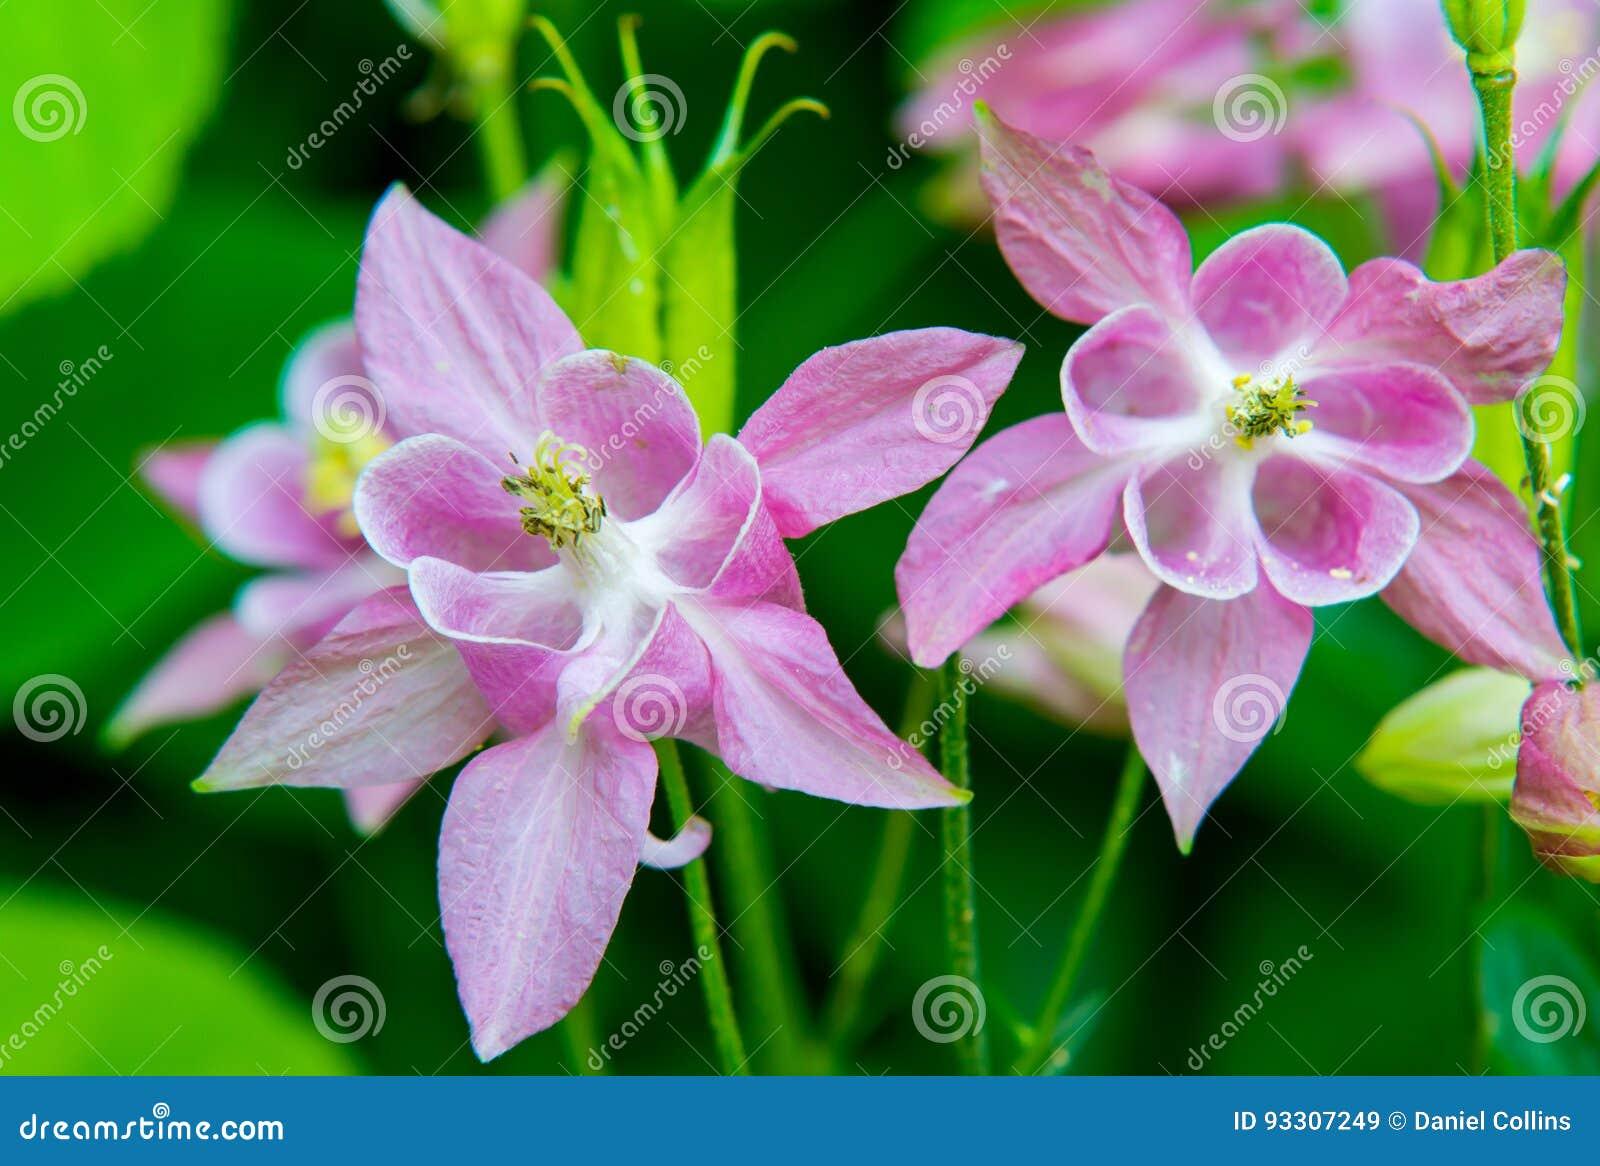 Cool white columbine flower contemporary wedding and flowers pink and white columbine flower blossoms stock image image of izmirmasajfo Images